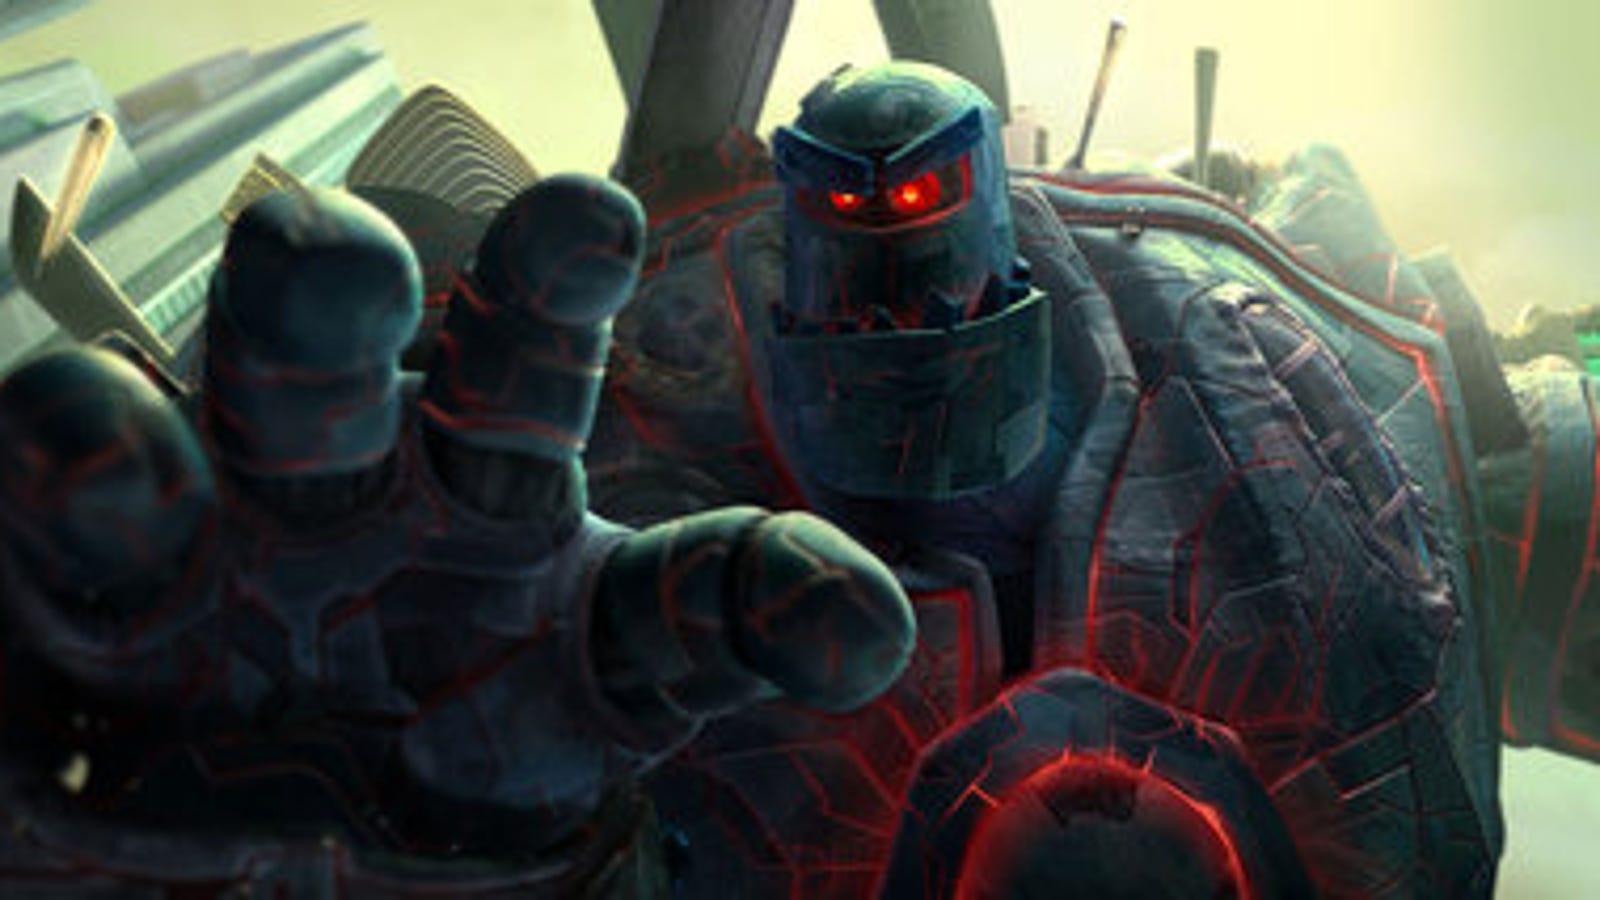 Crazy Robot Battles In New Astro Boy Clips